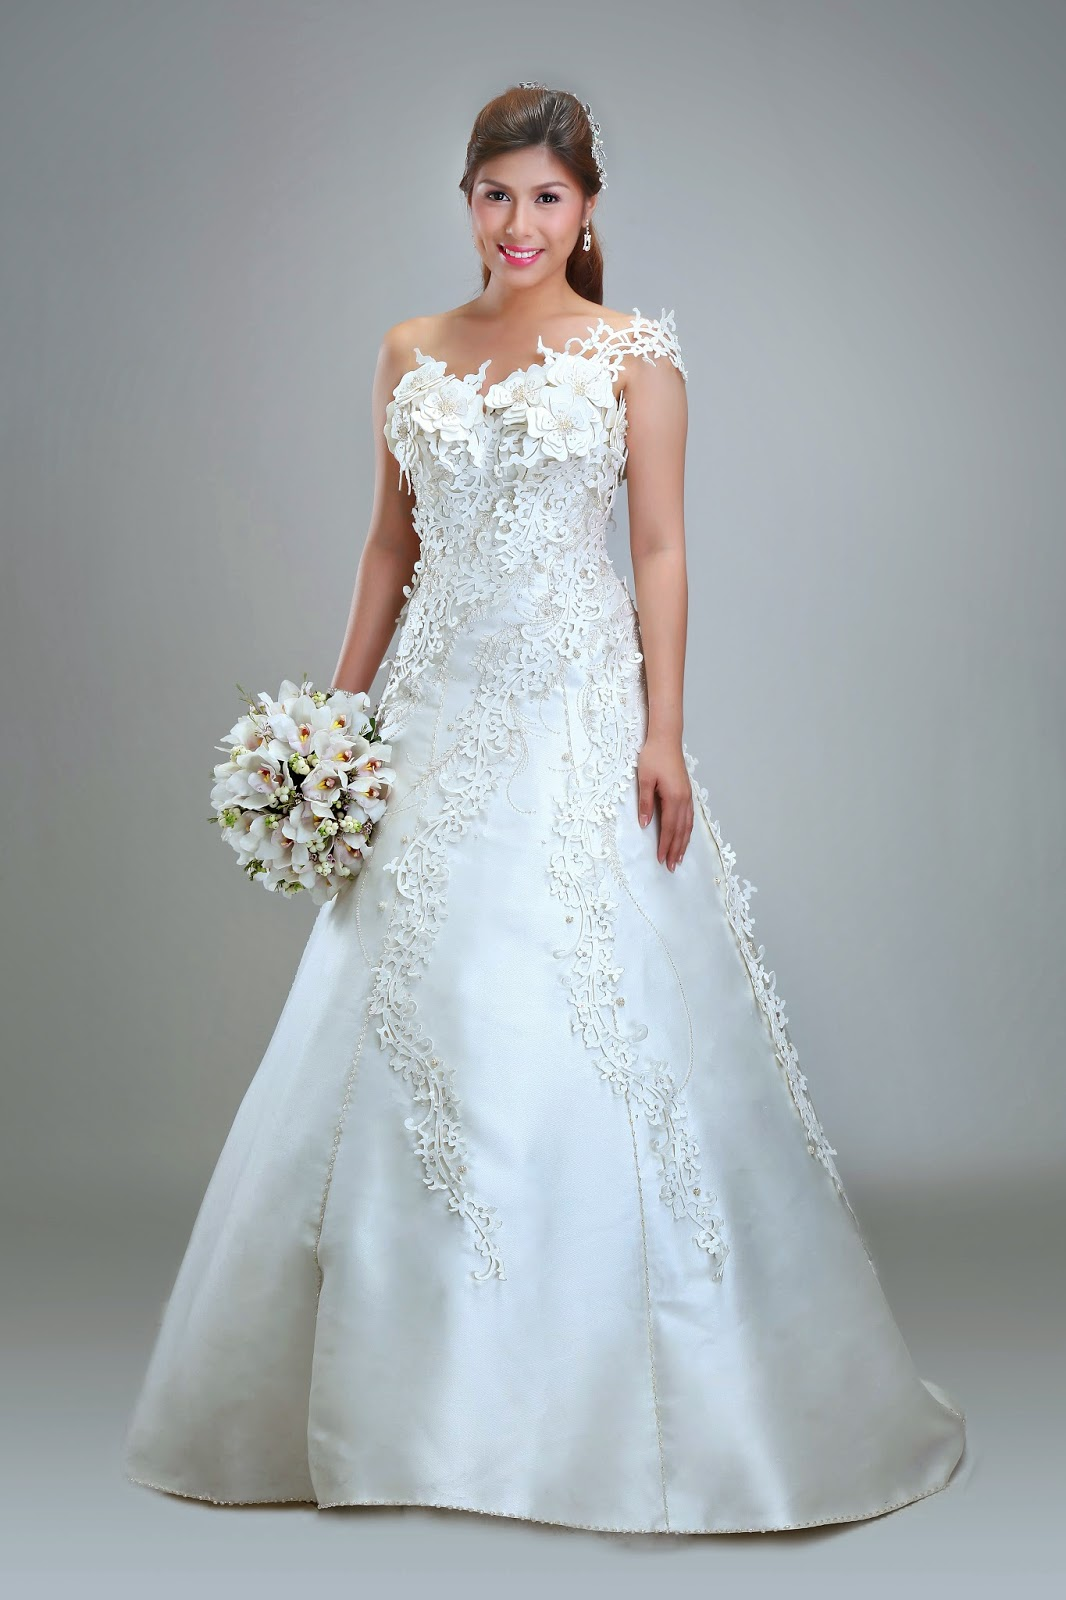 Philippines Bridal Gown Designer (Edward Teng)